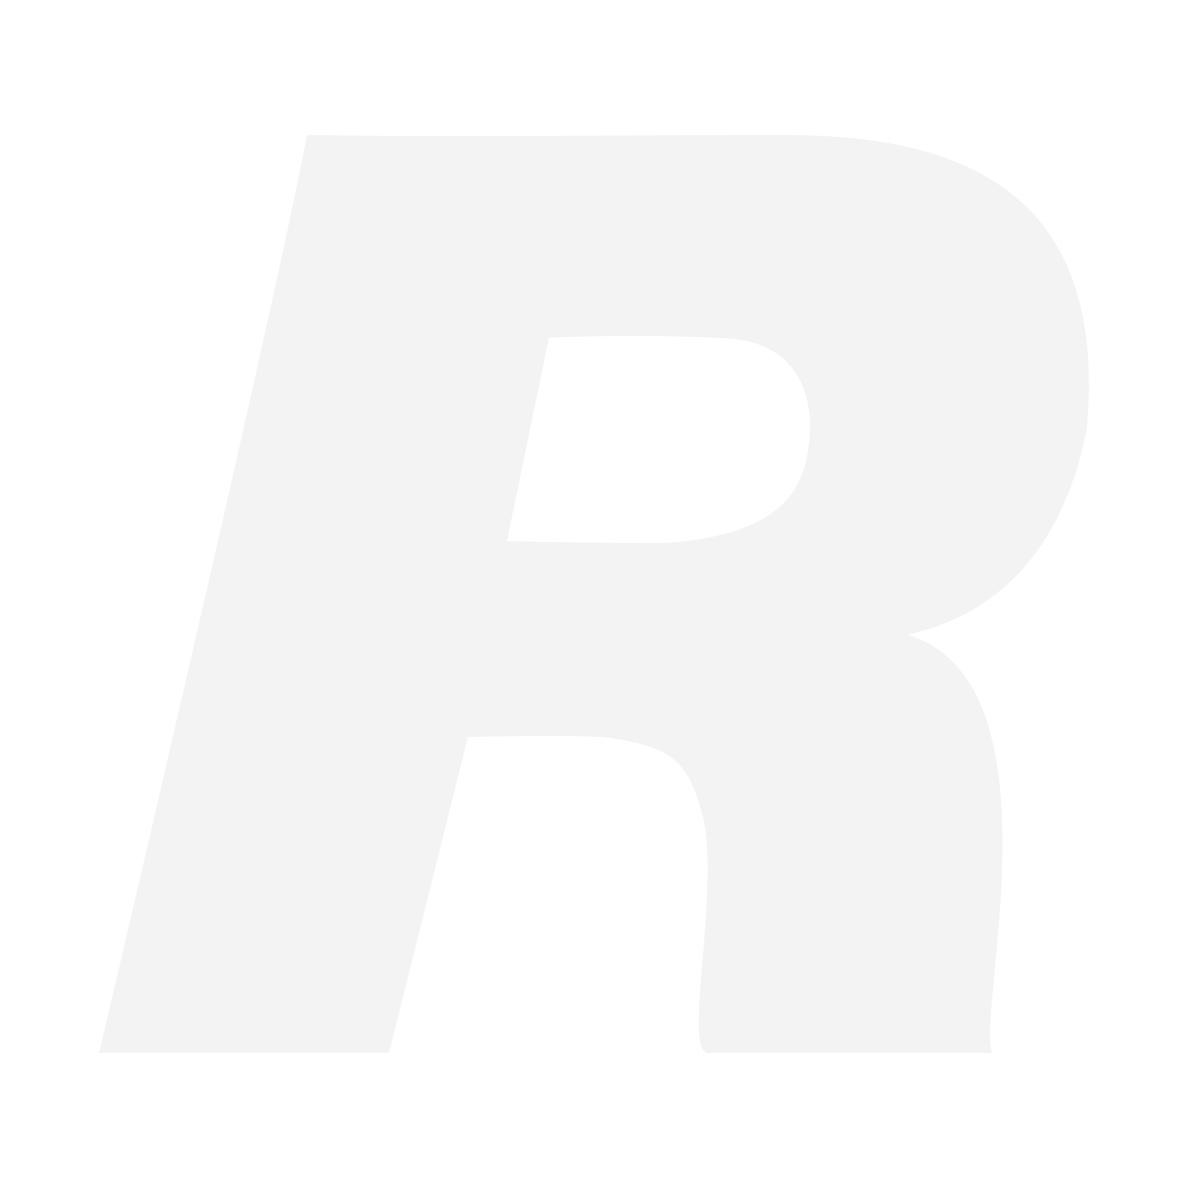 EPSON T0807 MULTIPACK  (R585/R685)